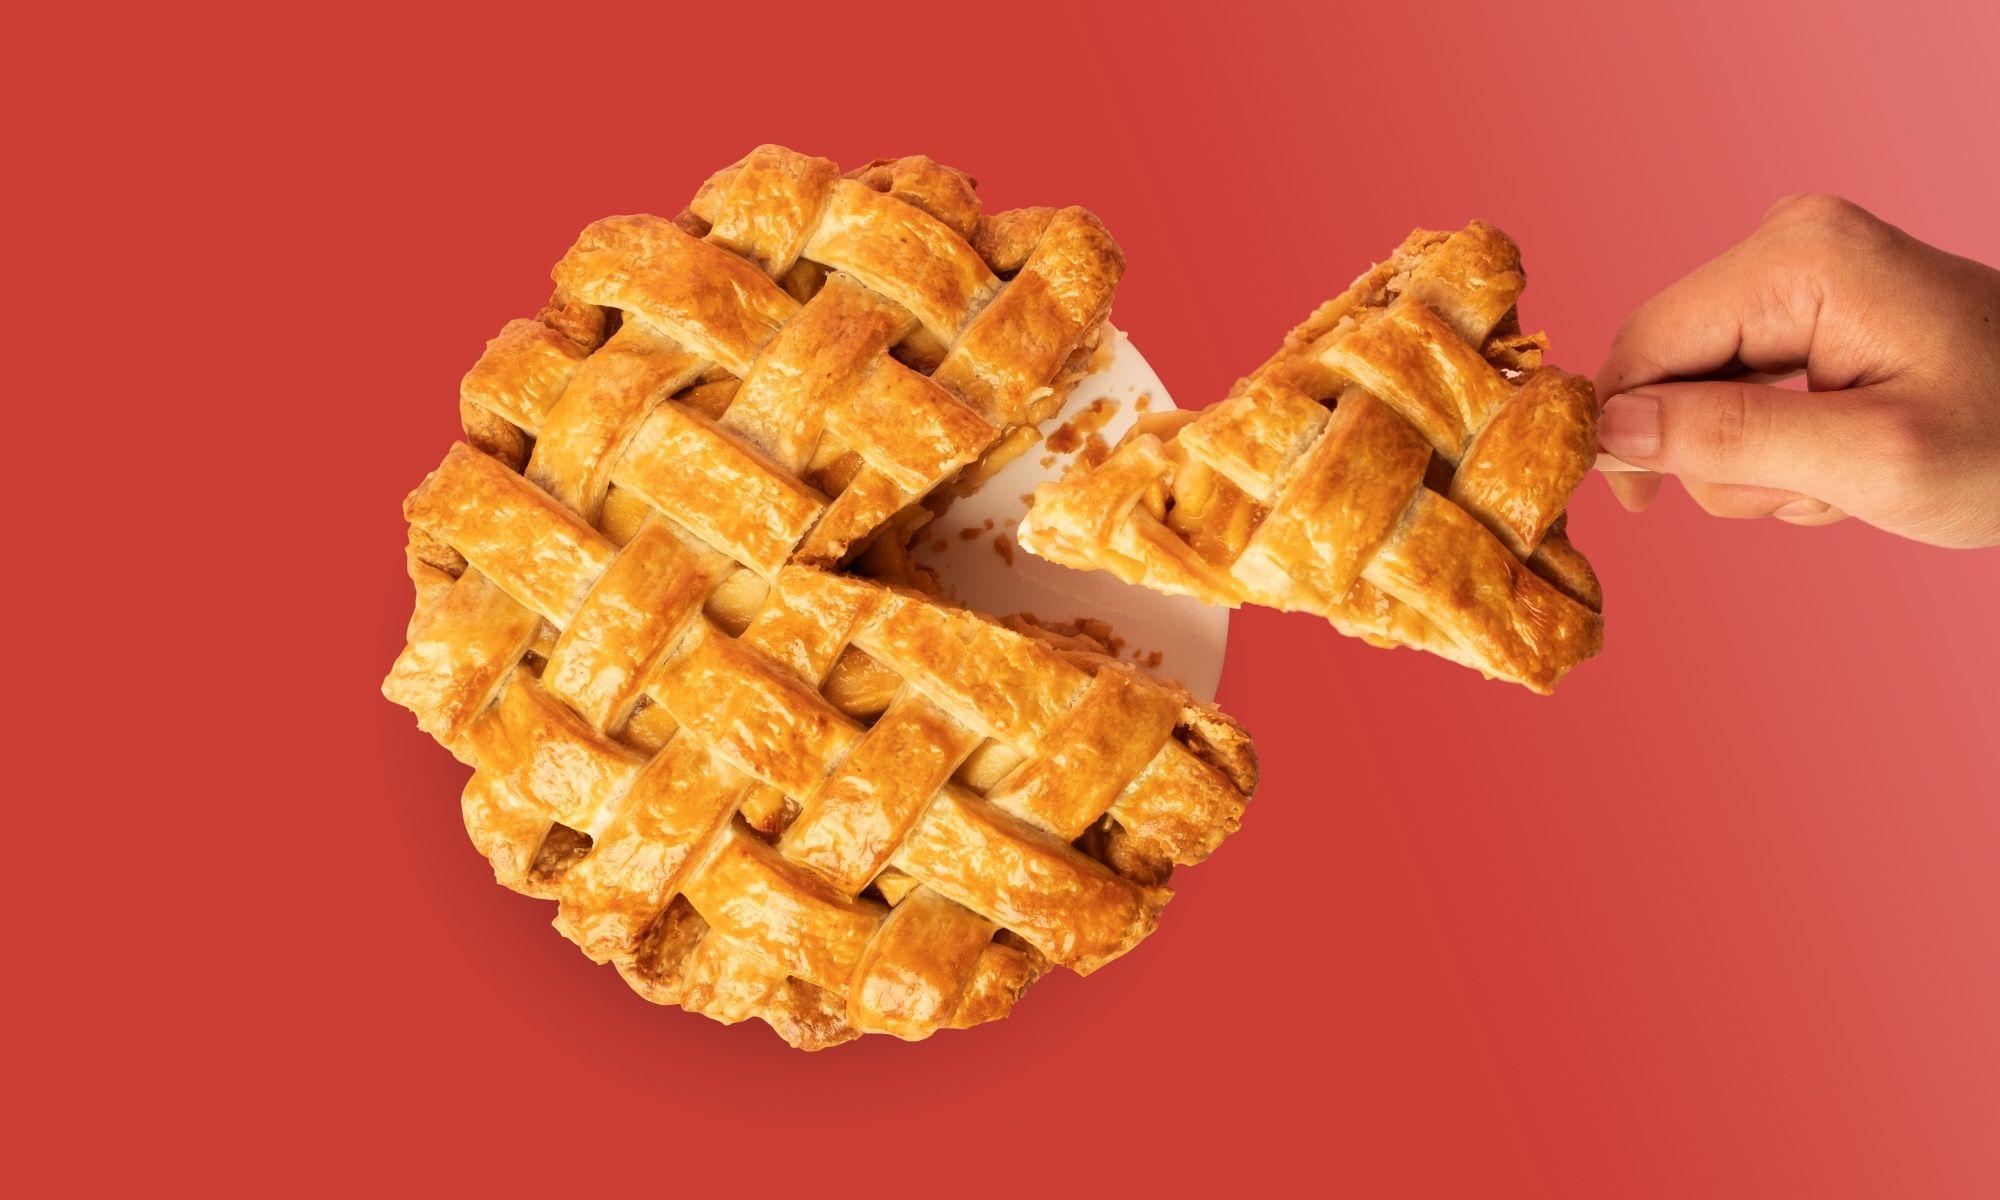 Tatler's Guide To Hong Kong's Best Apple Pies